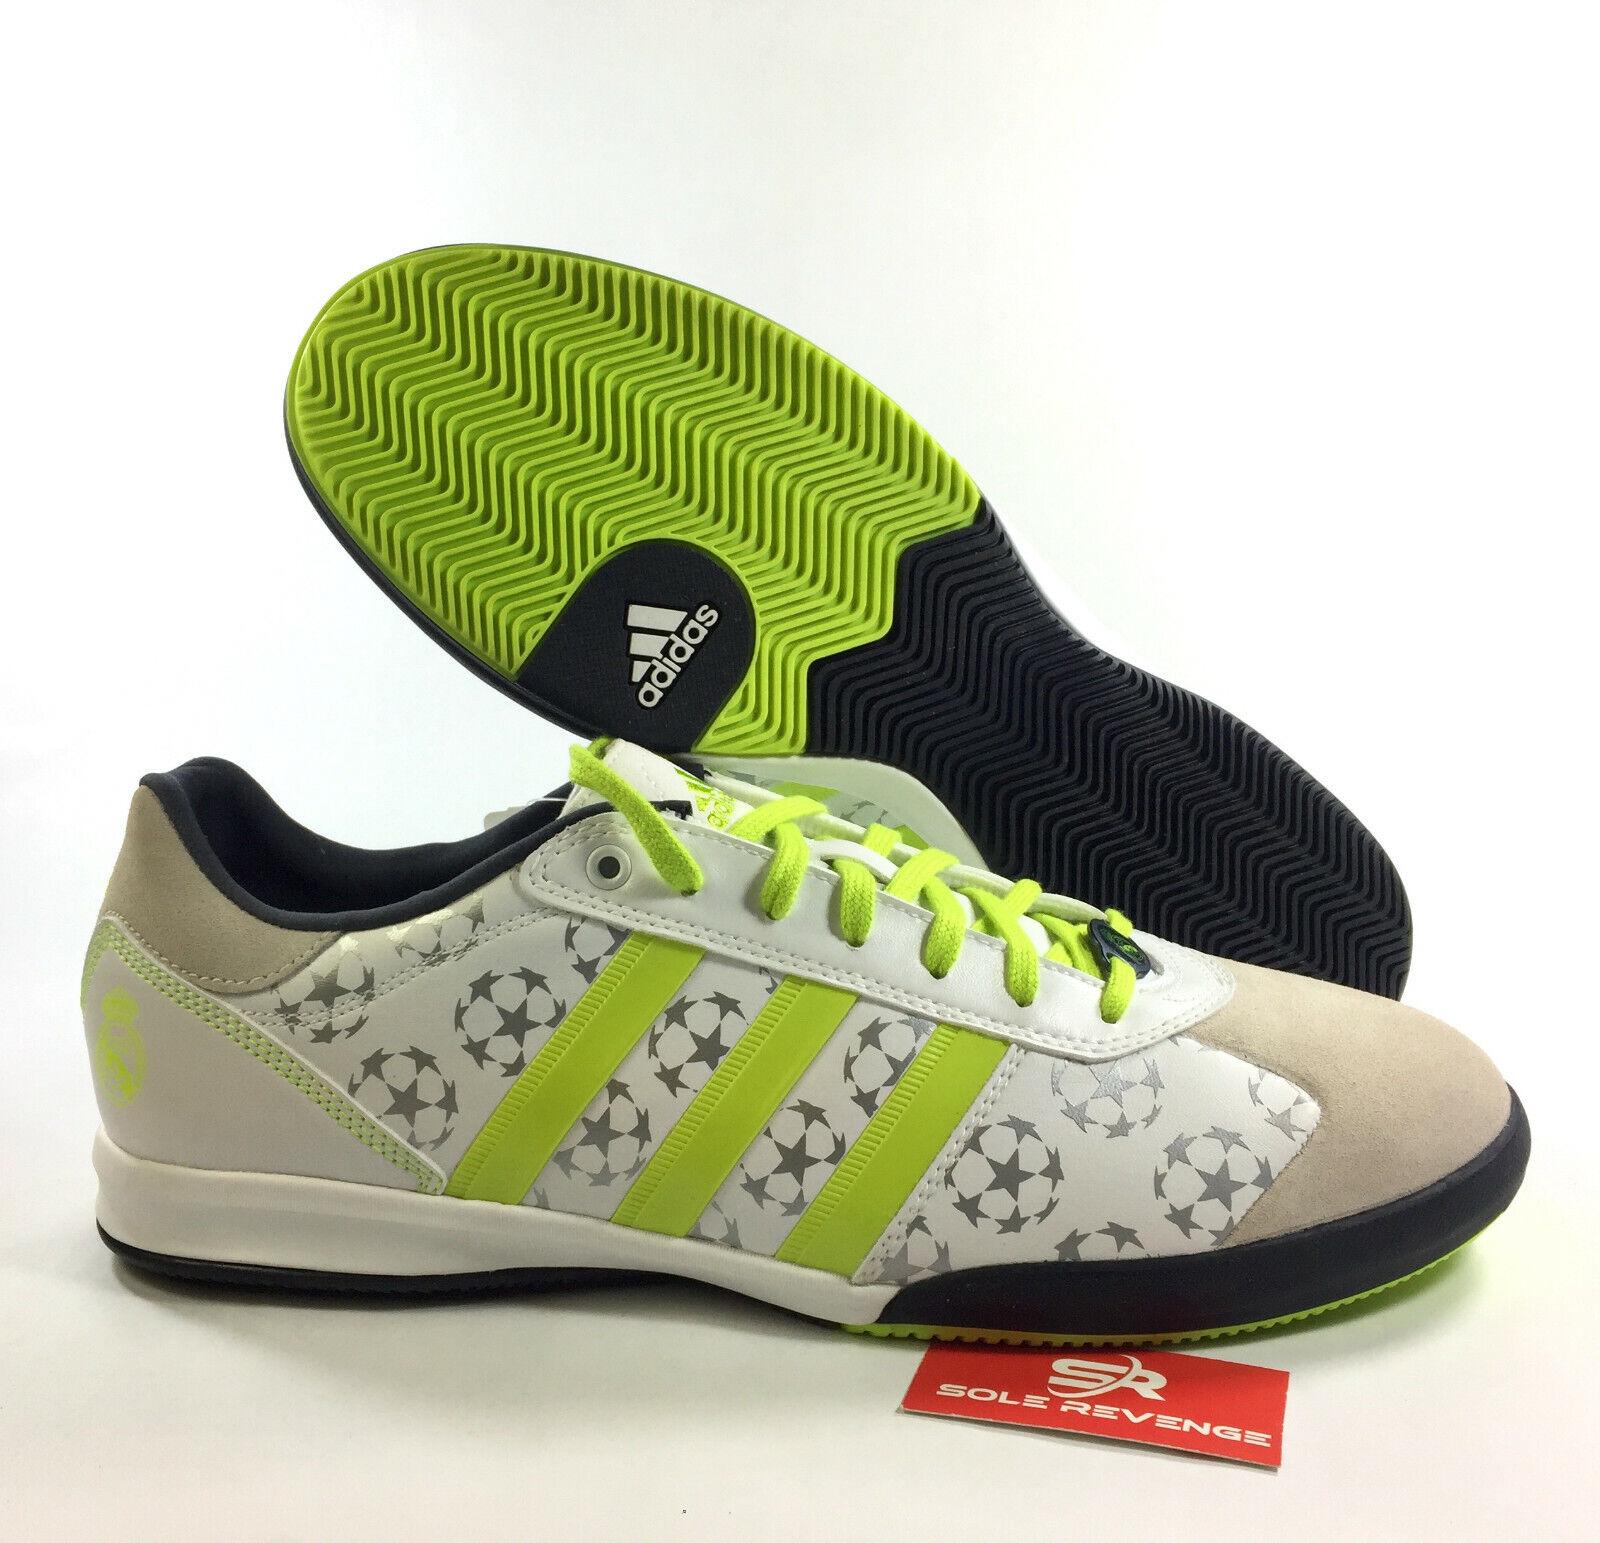 eea0501409de4 New adidas AdiStreet Real Madrid Theme Leisure shoes Soccer White Yellow  G19501